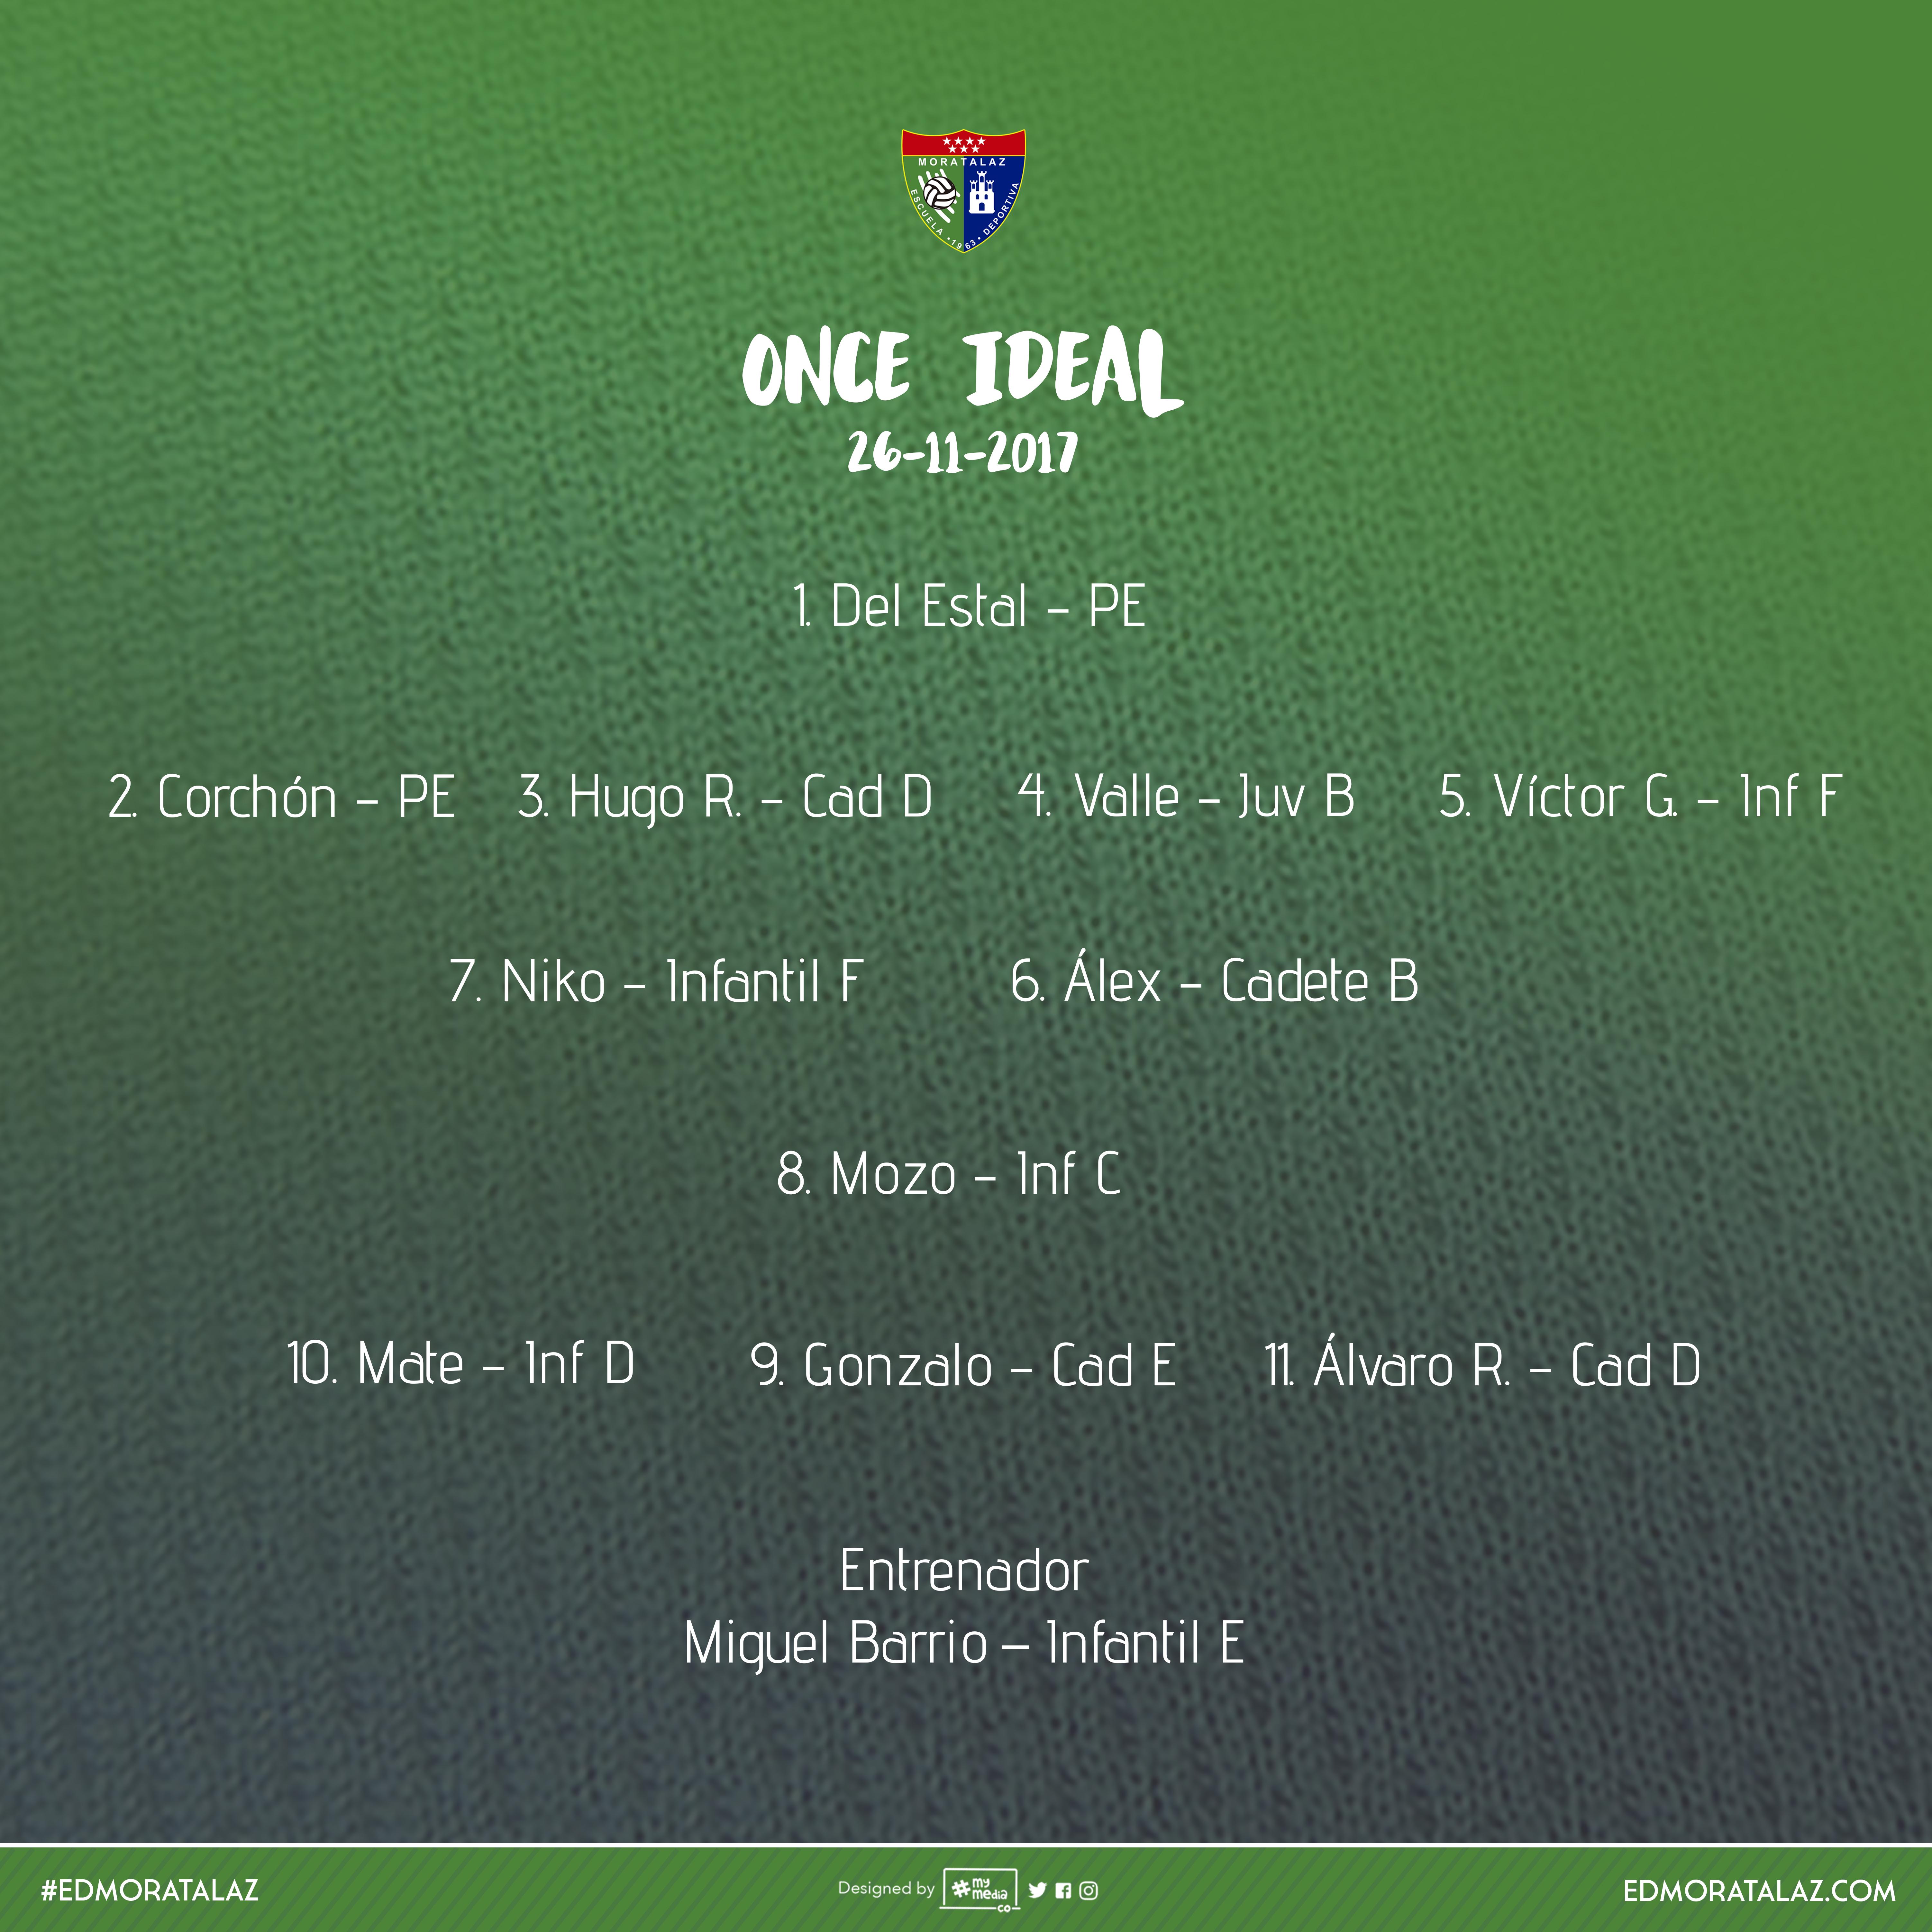 Once ideal del fin de semana 25-26 de noviembre, Temporada 2017/18